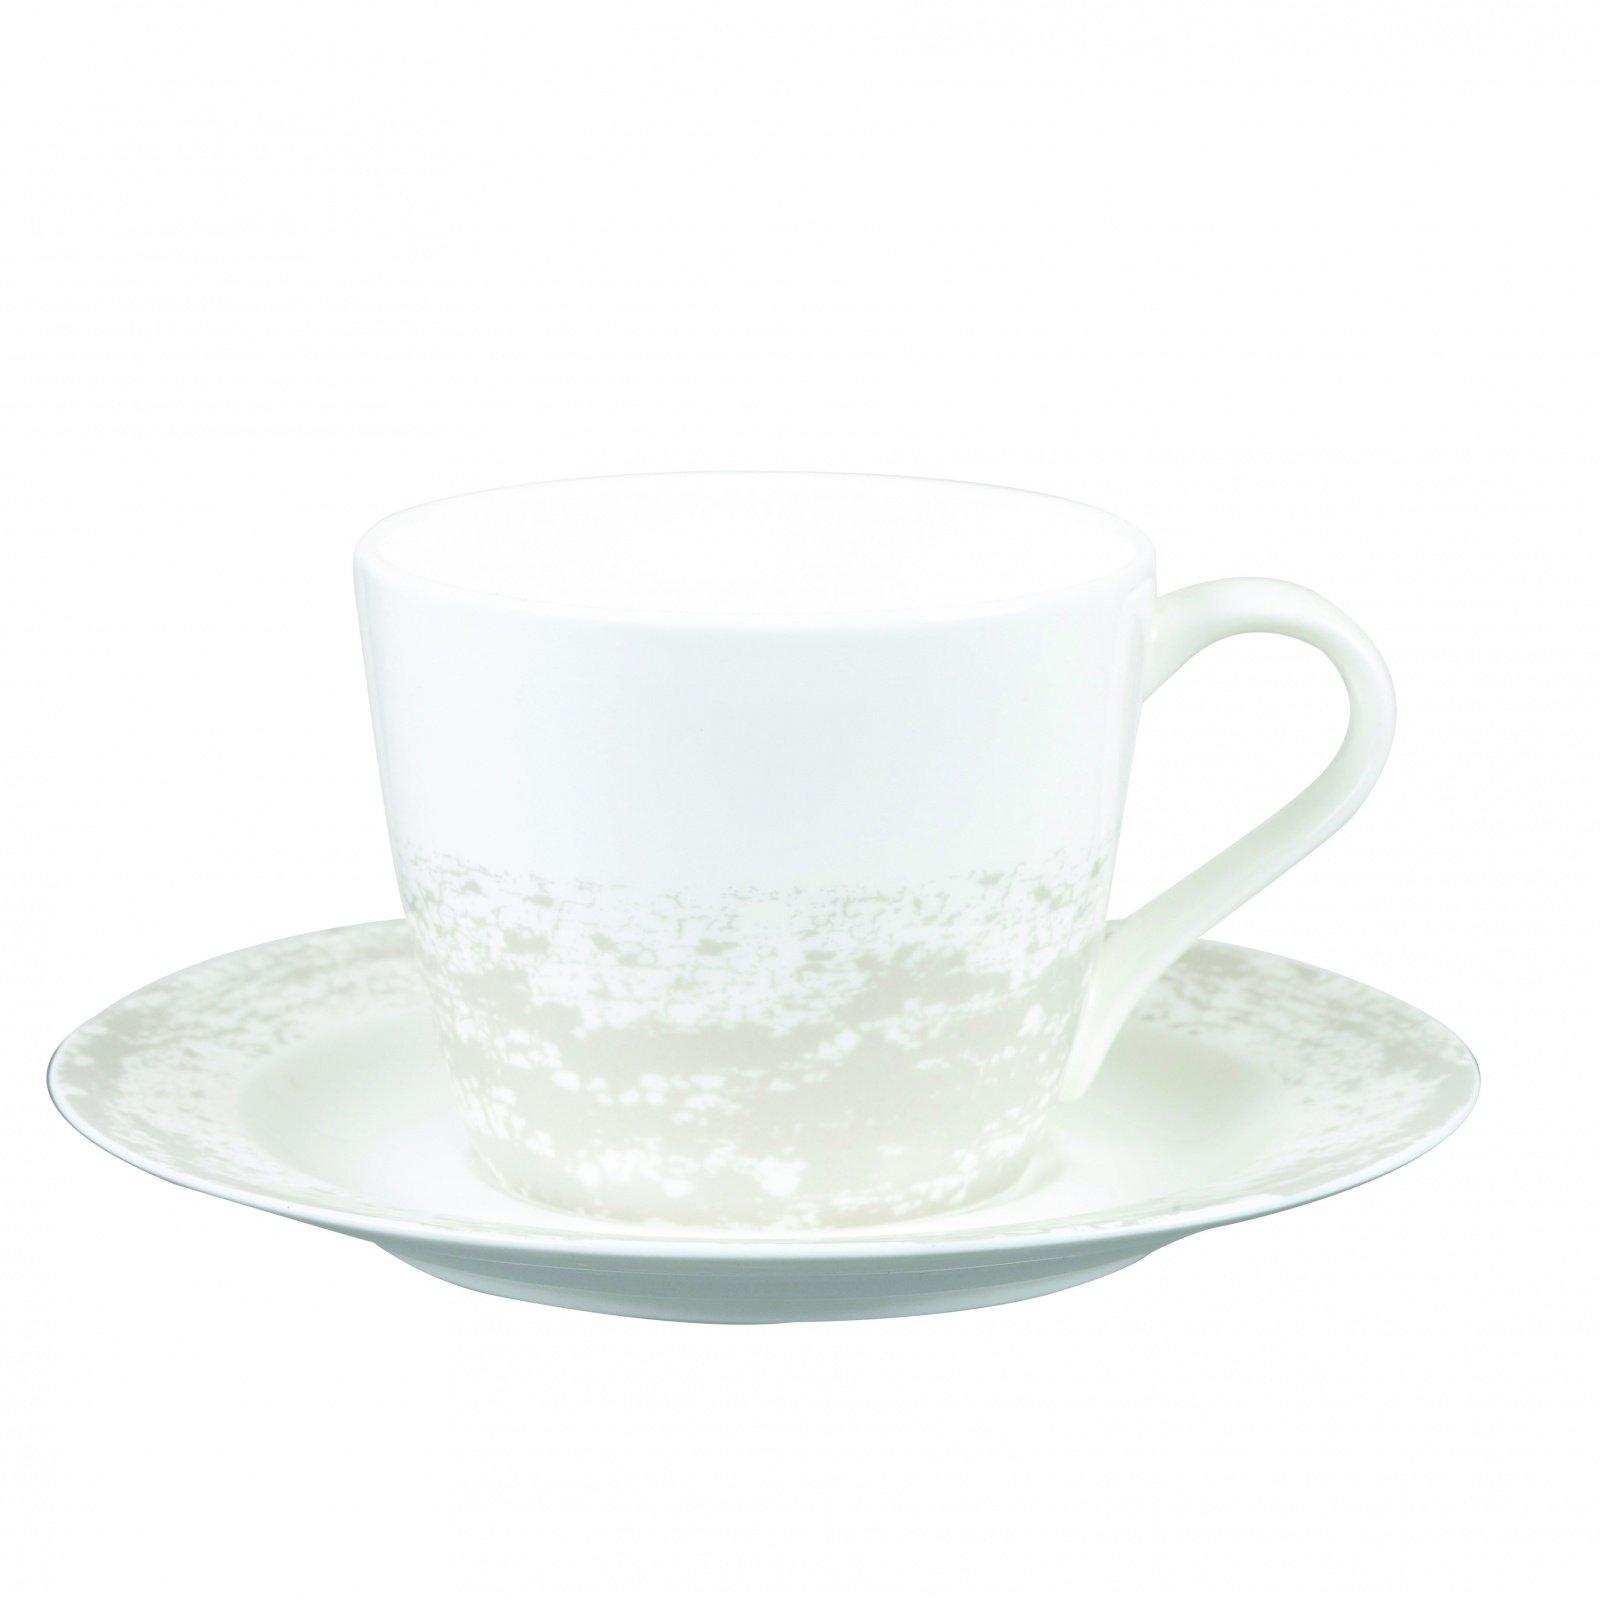 Чашка с блюдцем Churchill 200мл Эгломизе от Арлекин